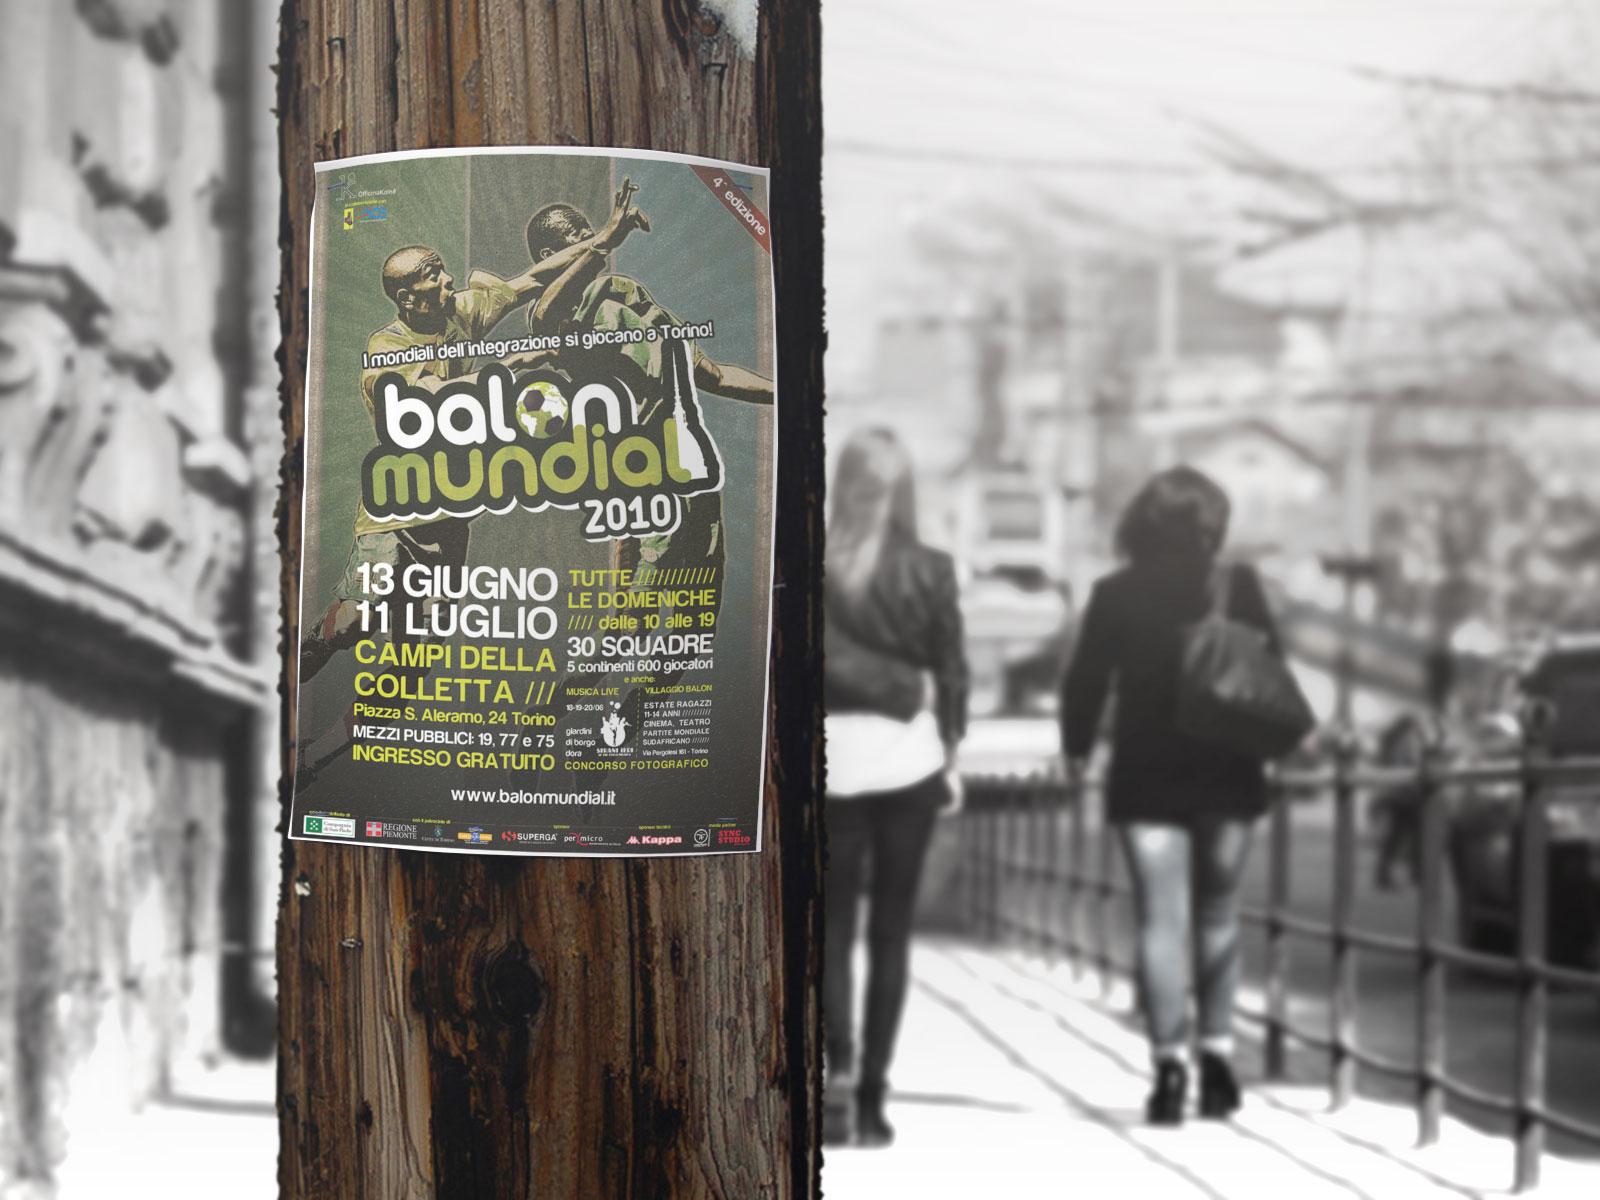 BalonMundial-2010-Poster-Mockup